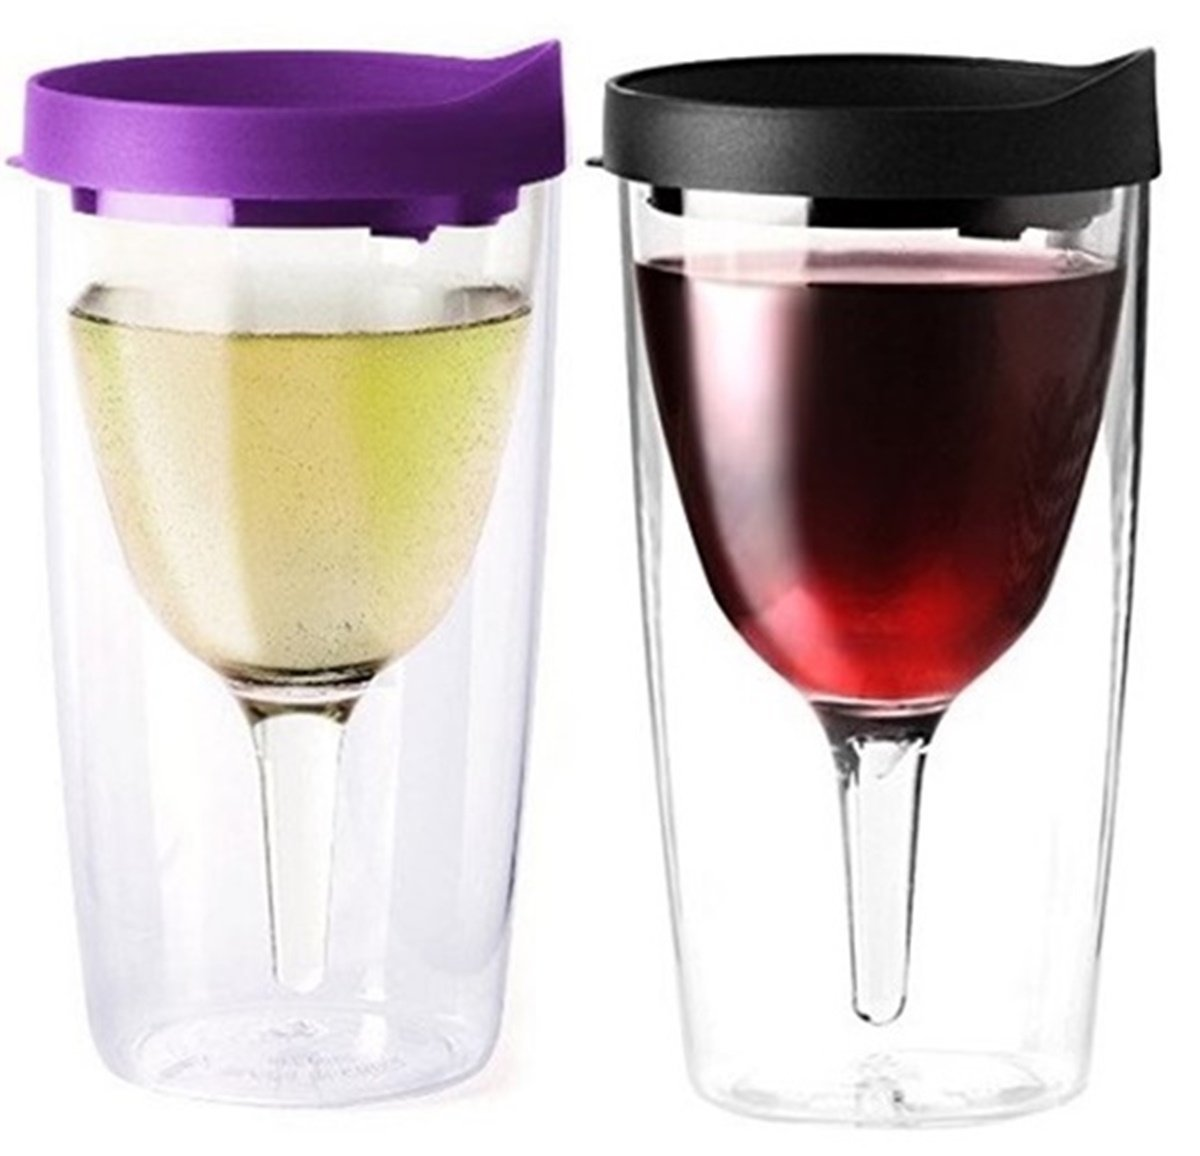 Have vino, will travel. - $